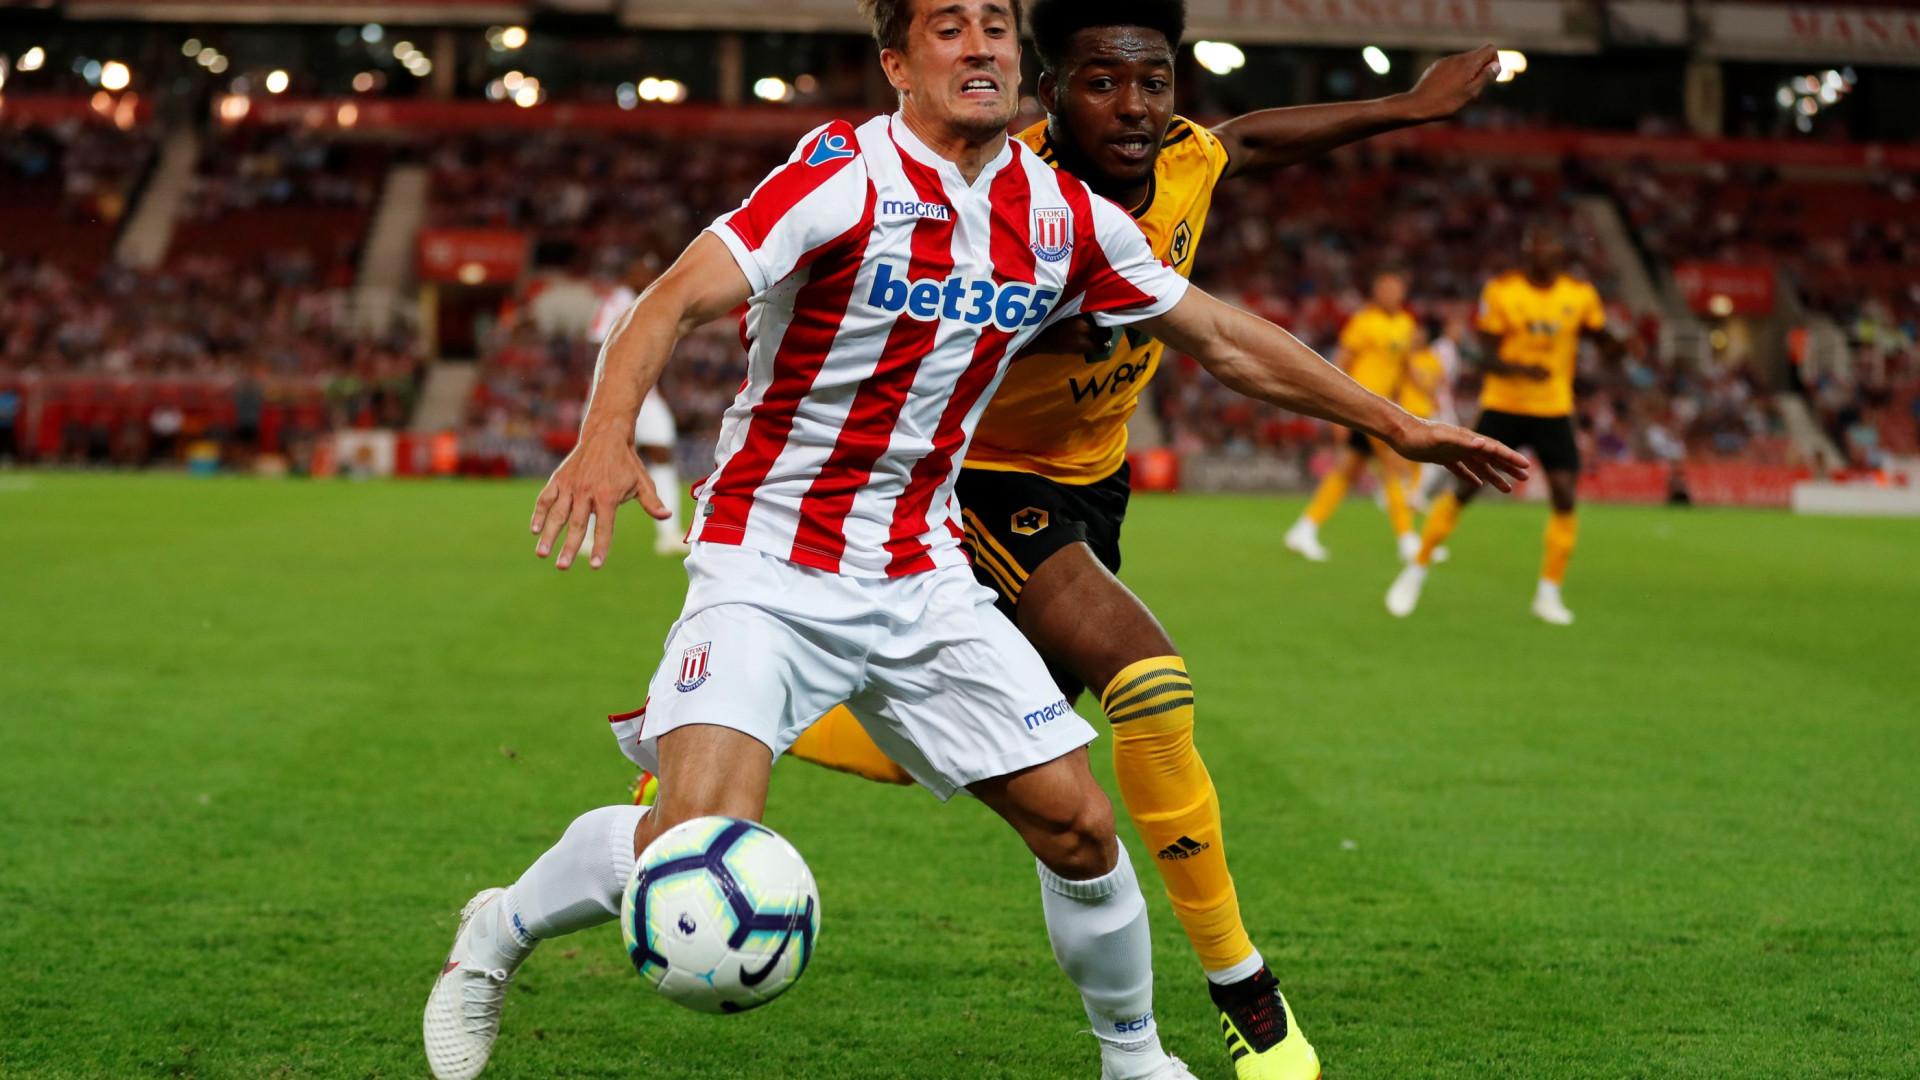 Imprensa espanhola aponta Bojan Krkic a FC Porto e Benfica